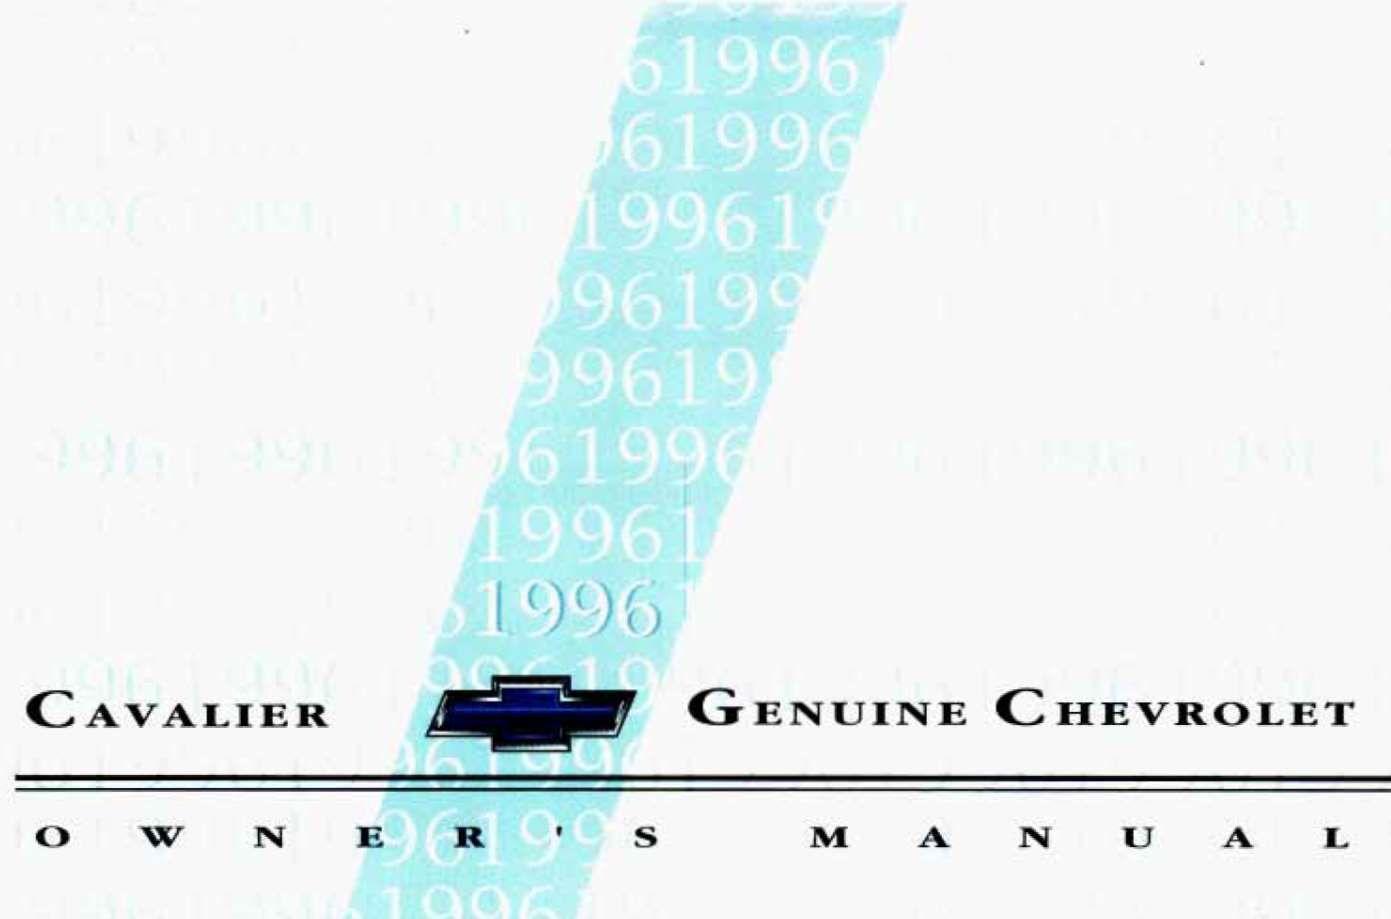 Chevrolet Cavalier 1996 Owner S Manual Has Been Published On Procarmanuals Com Https Procarmanuals Com Chevrolet Chevrolet Cavalier Owners Manuals Chevrolet